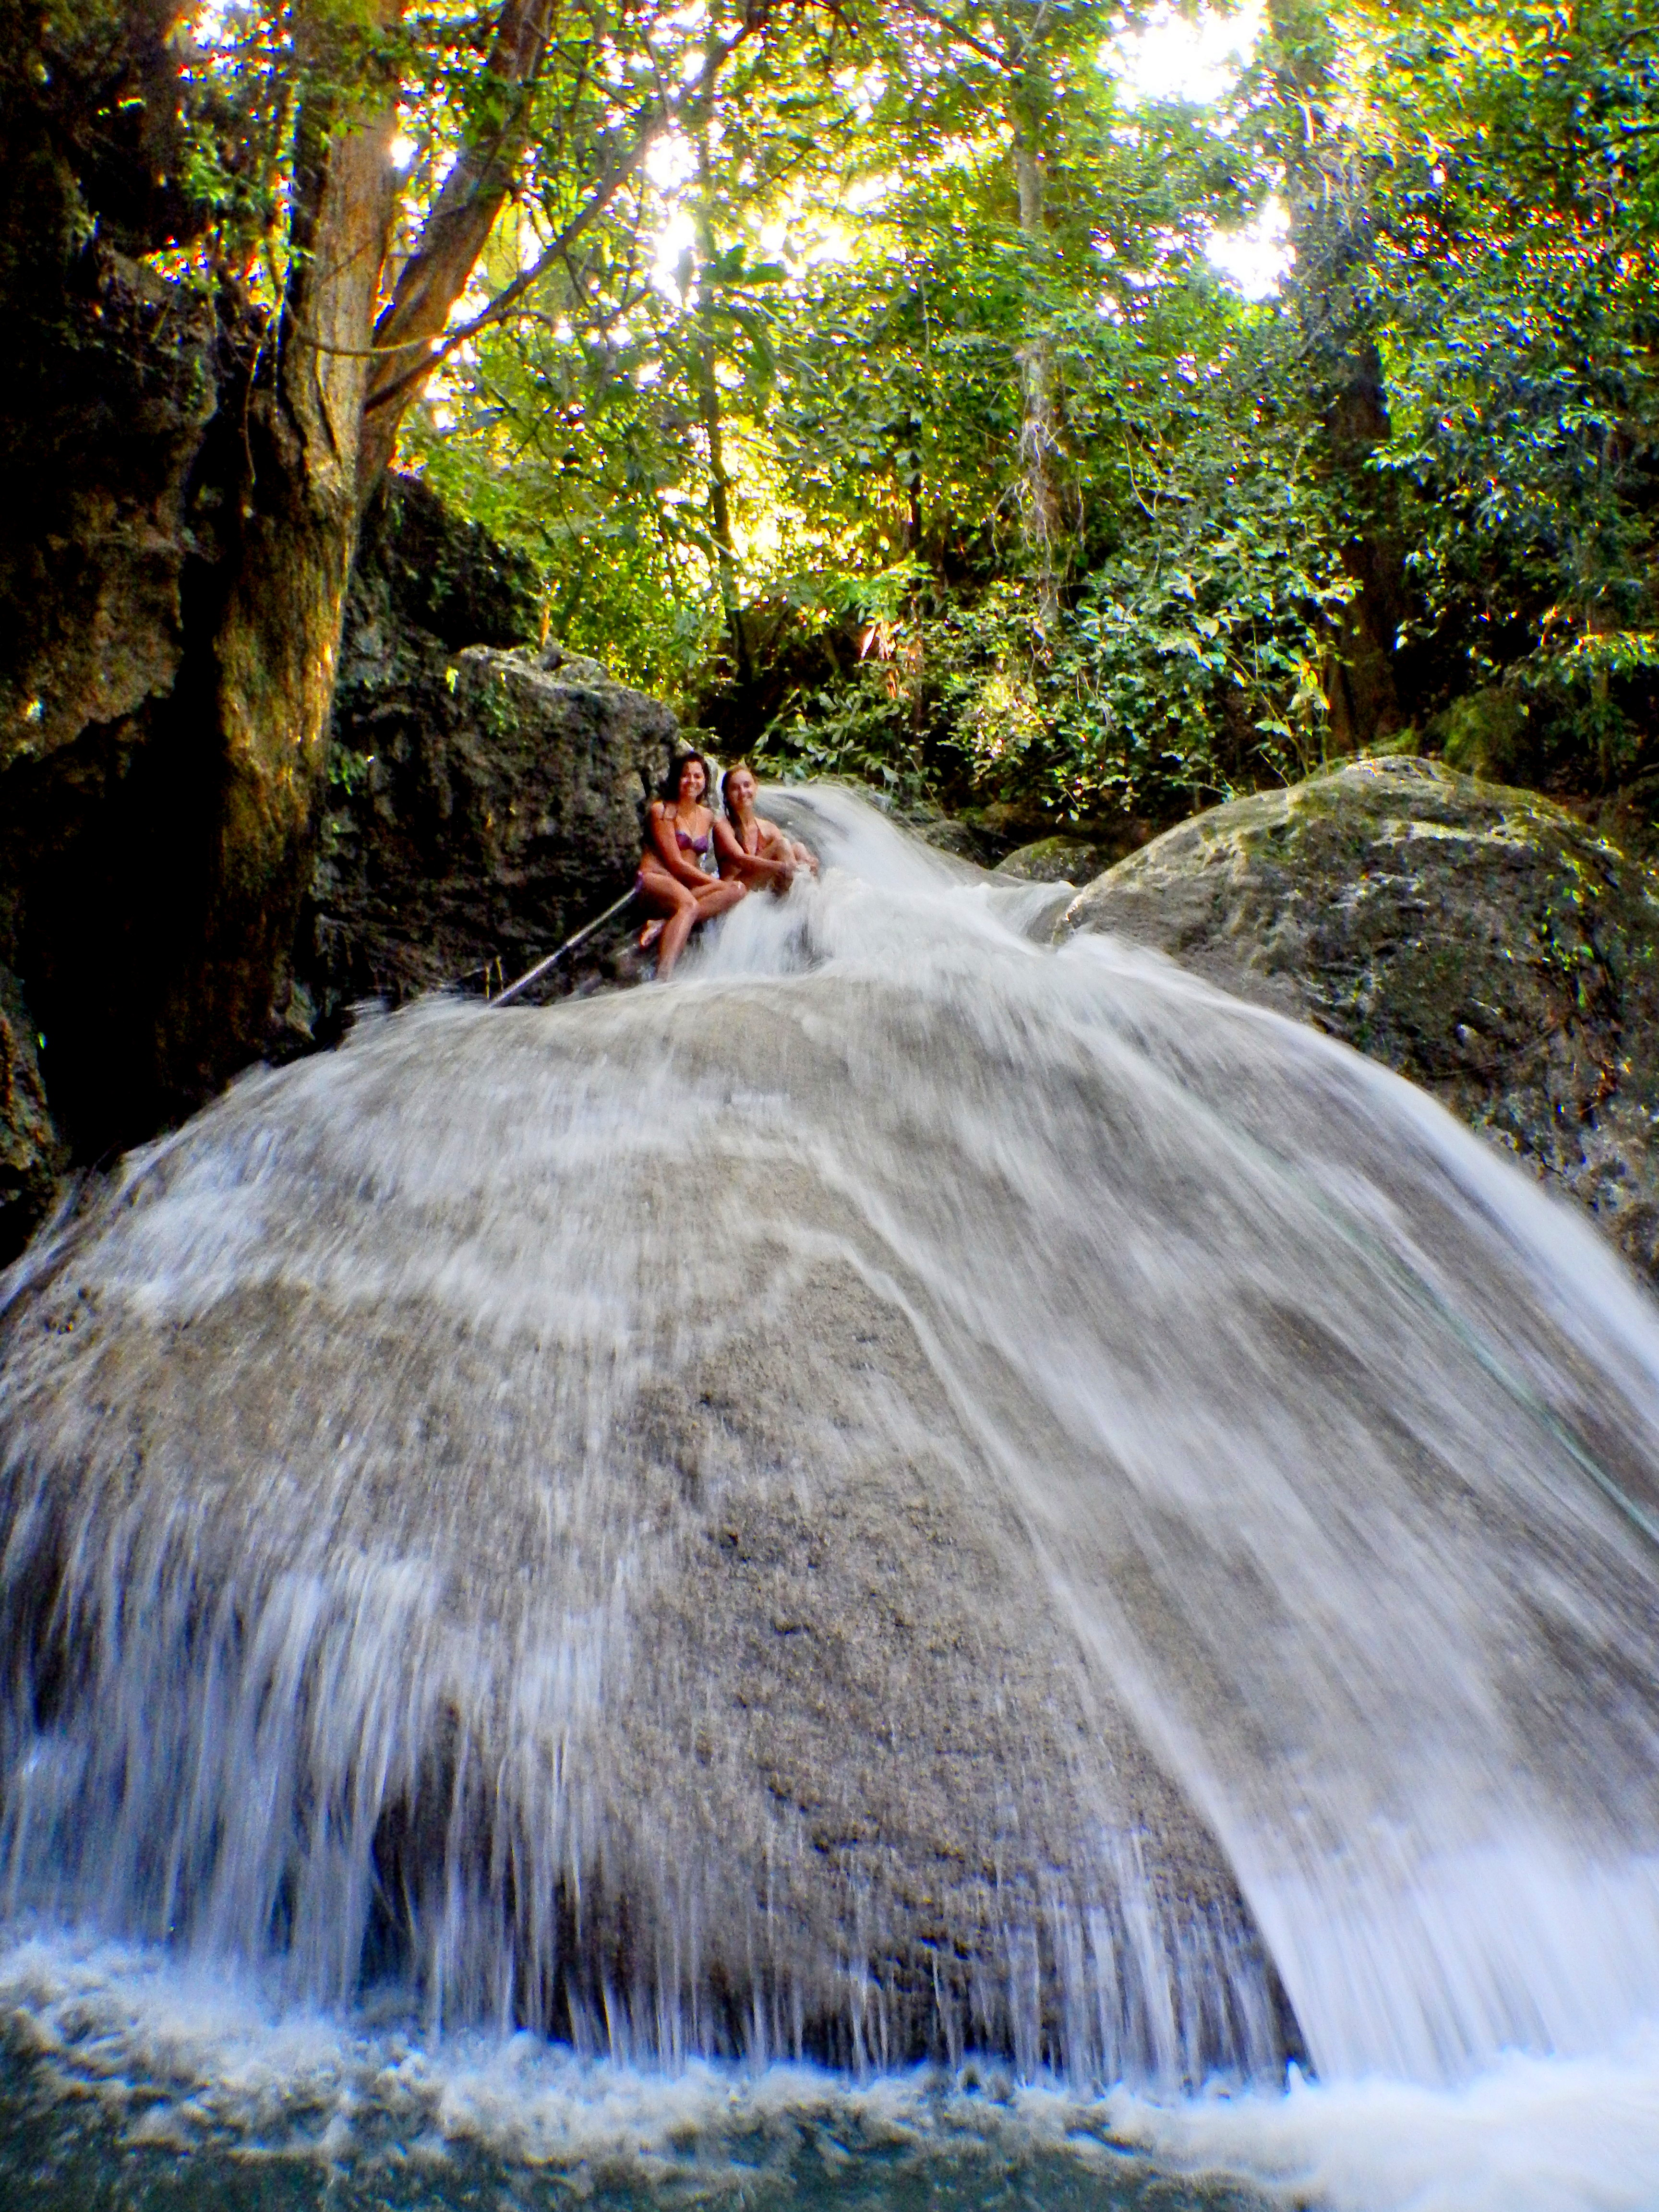 Erawan Waterfalls, Kanchanaburi, Thailand